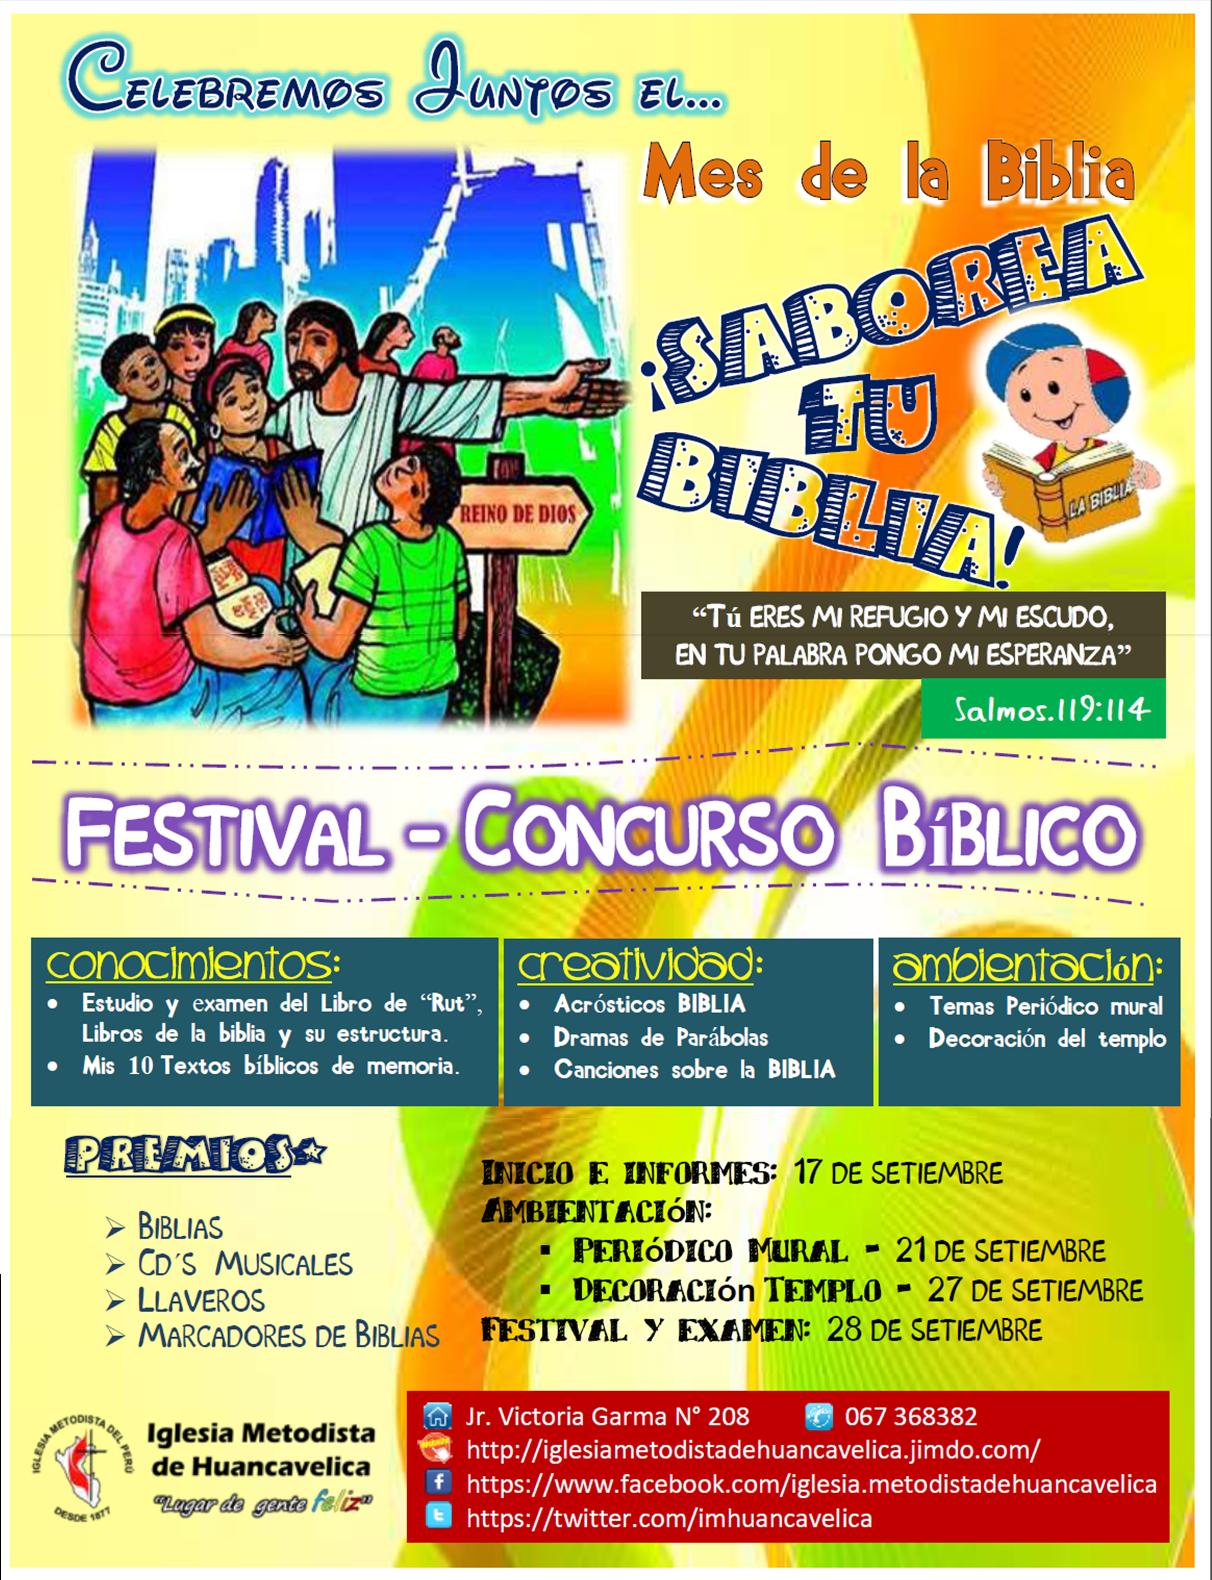 Festival Concurso Saborea Tu Biblia Iglesia Metodista De